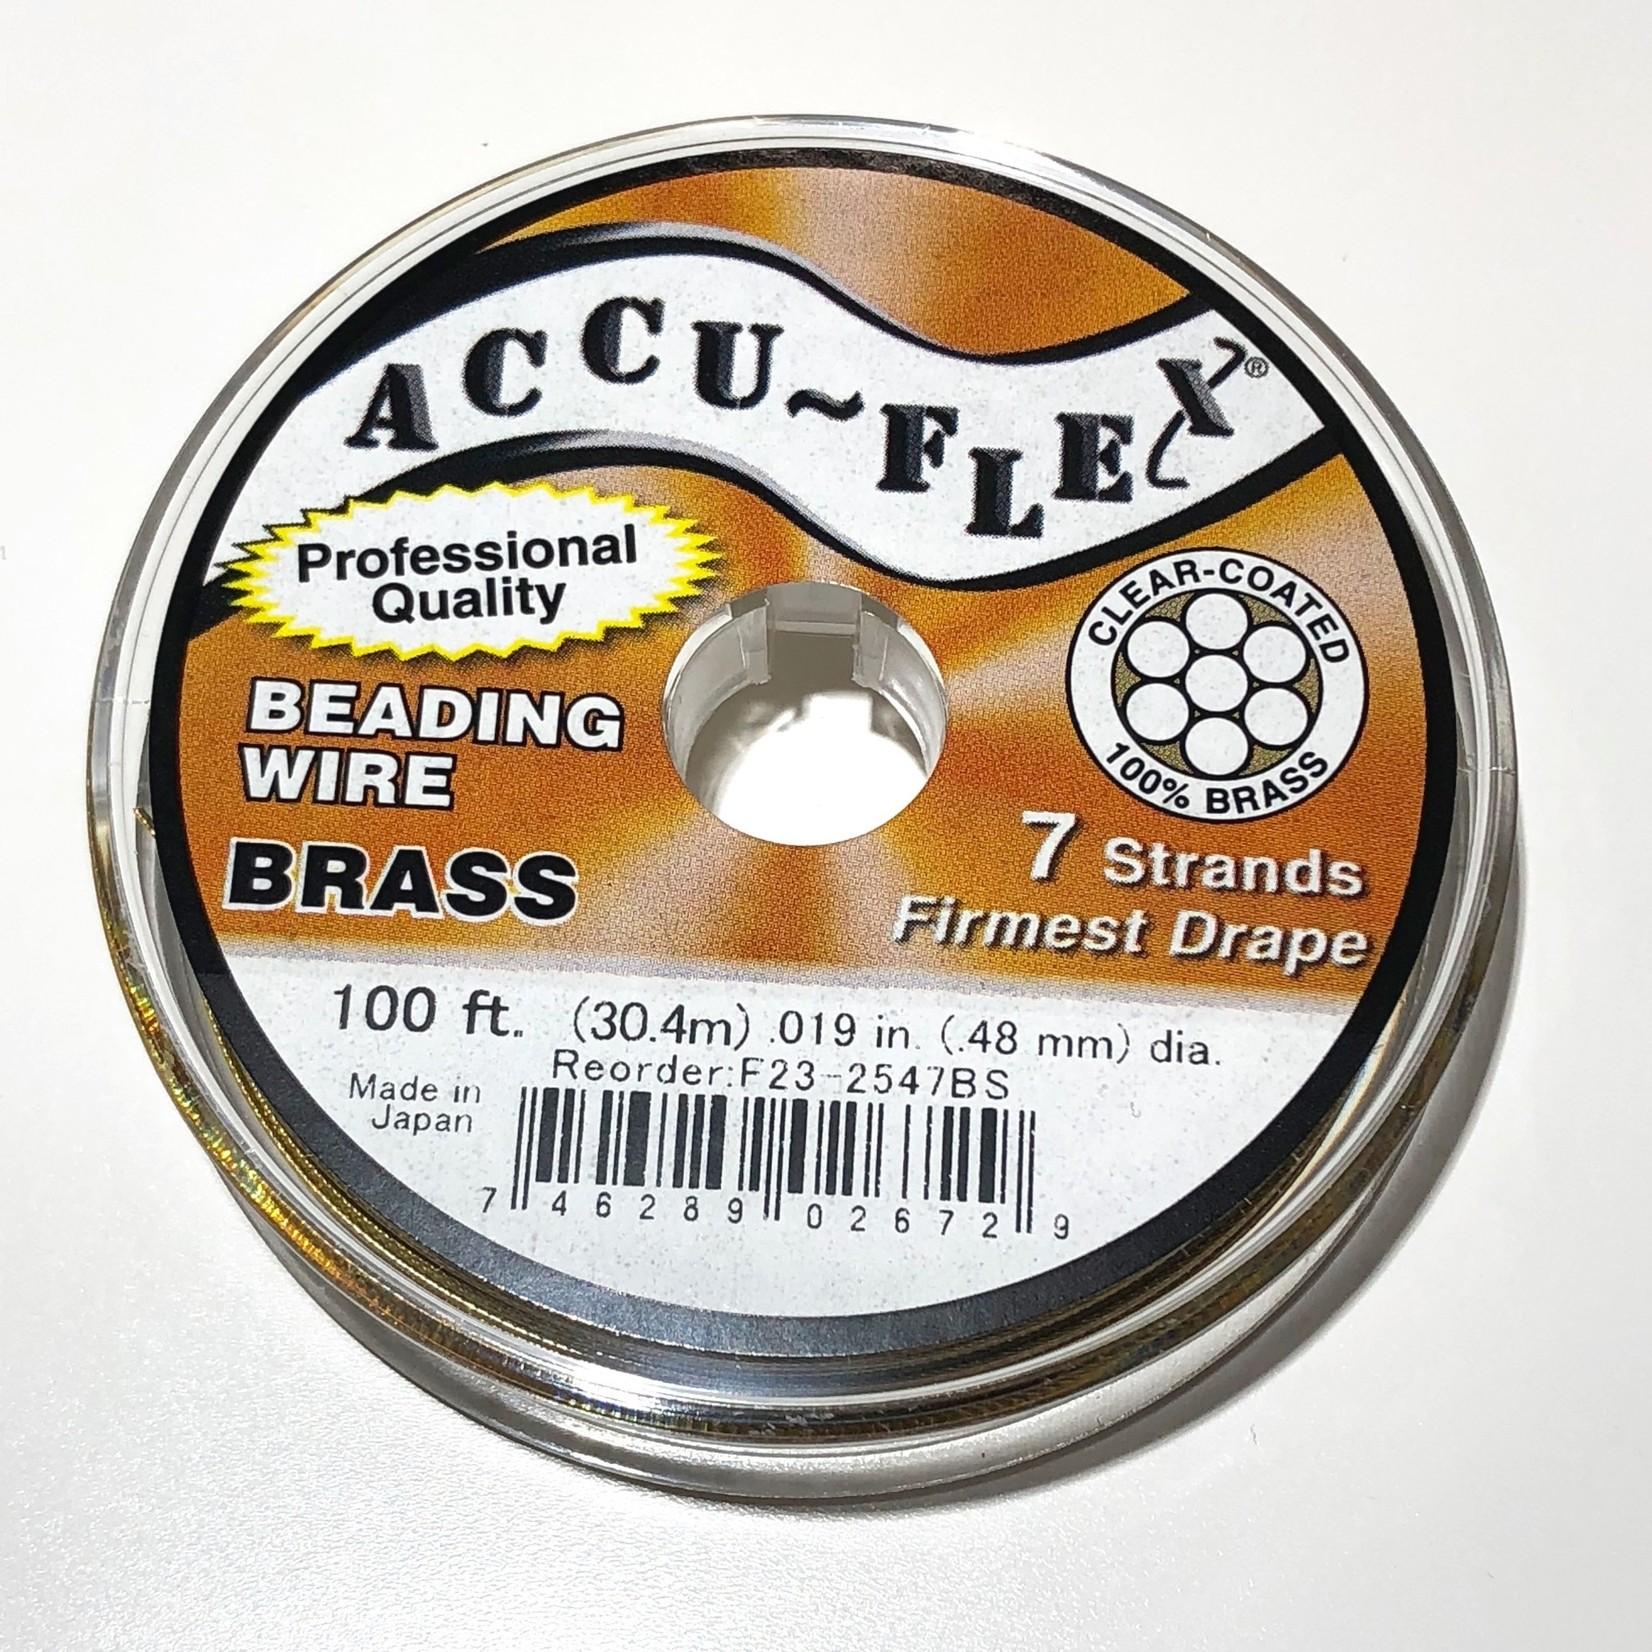 ACCU FLEX Bead Wire Brass 7 Strand .019in 100ft